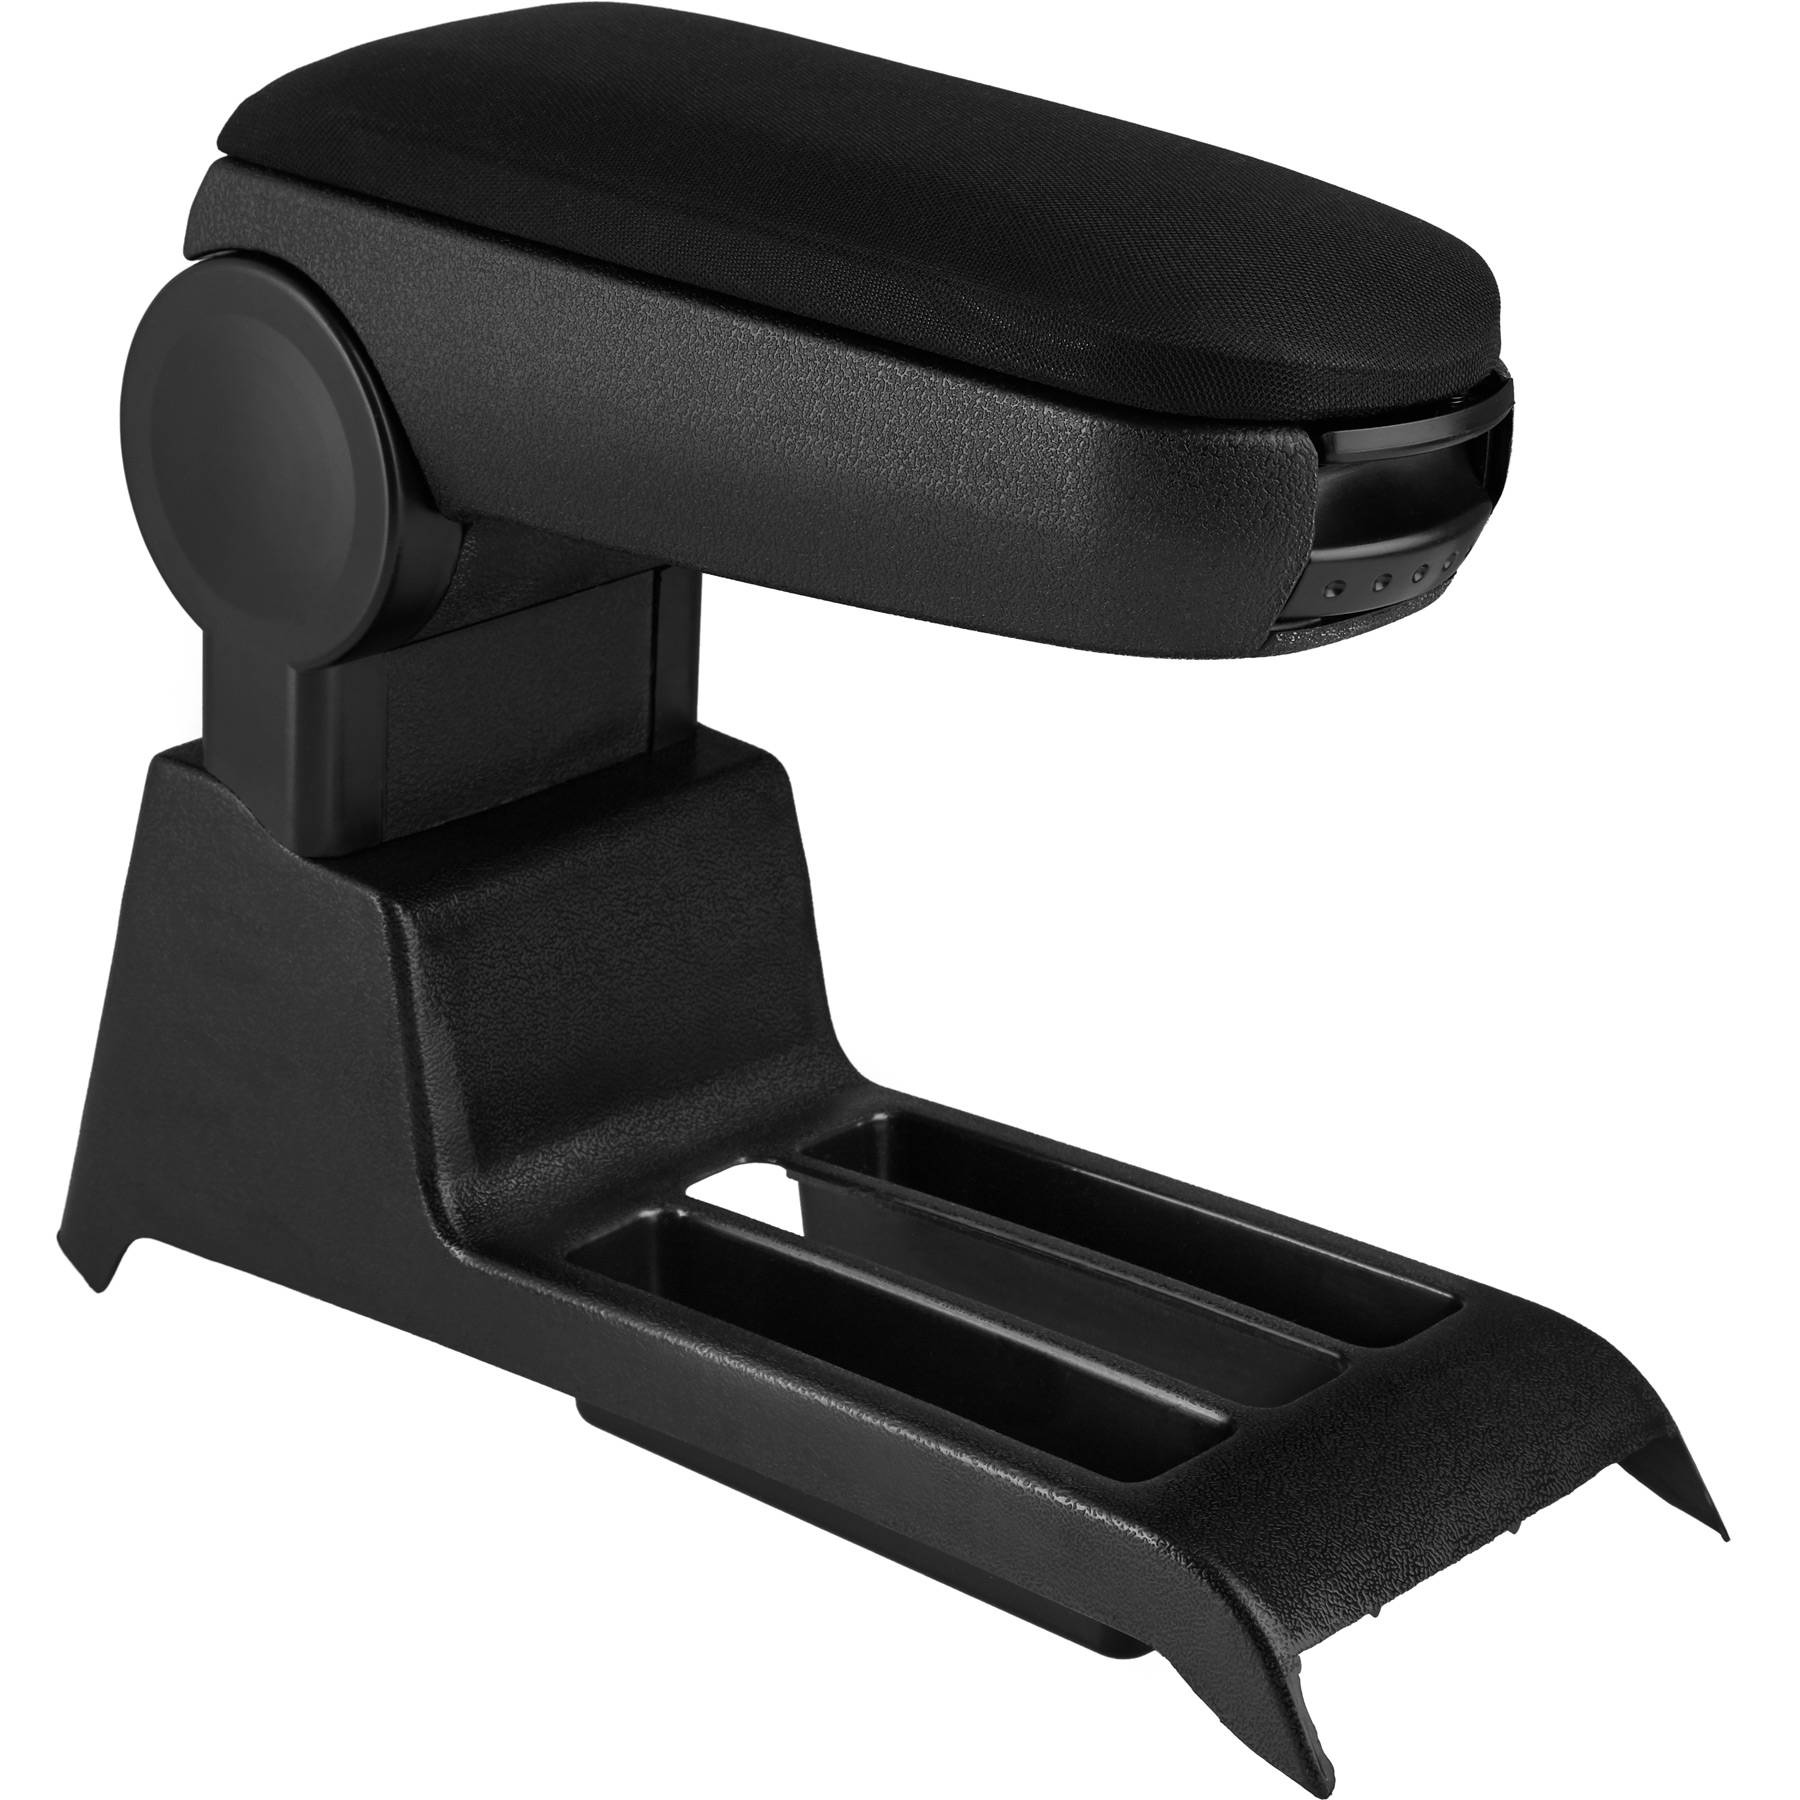 tectake Car armrest - VW Polo 9N/9N2/9N3 and VW Cross Polo